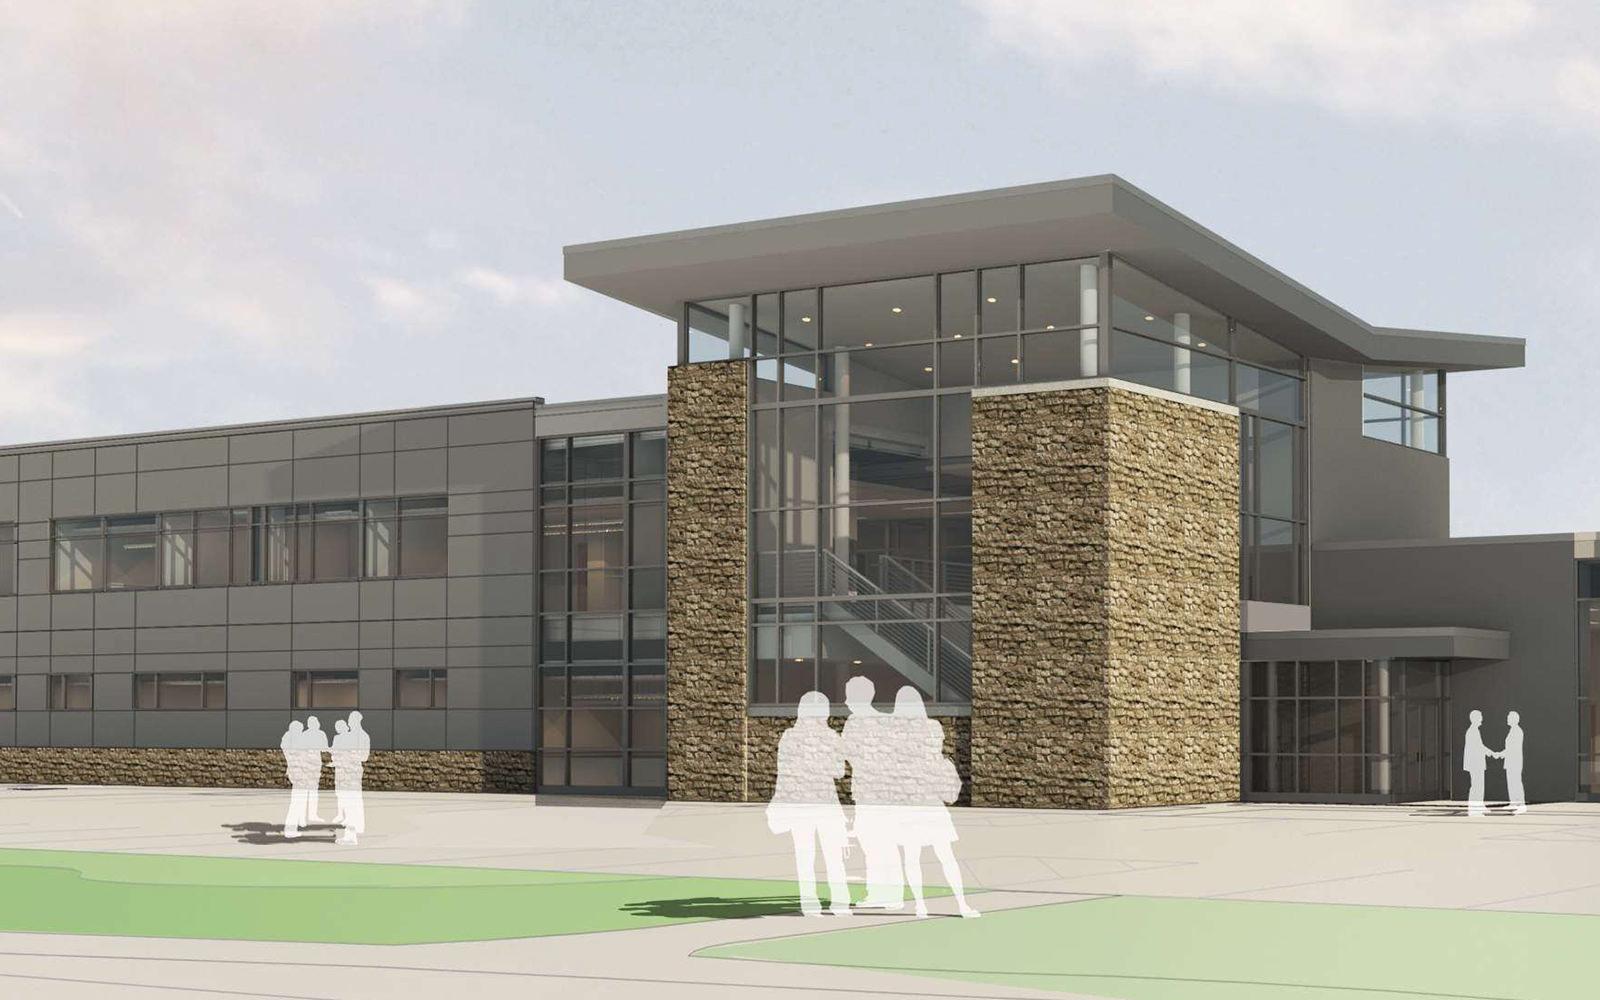 New Limerick Township Municipal Building